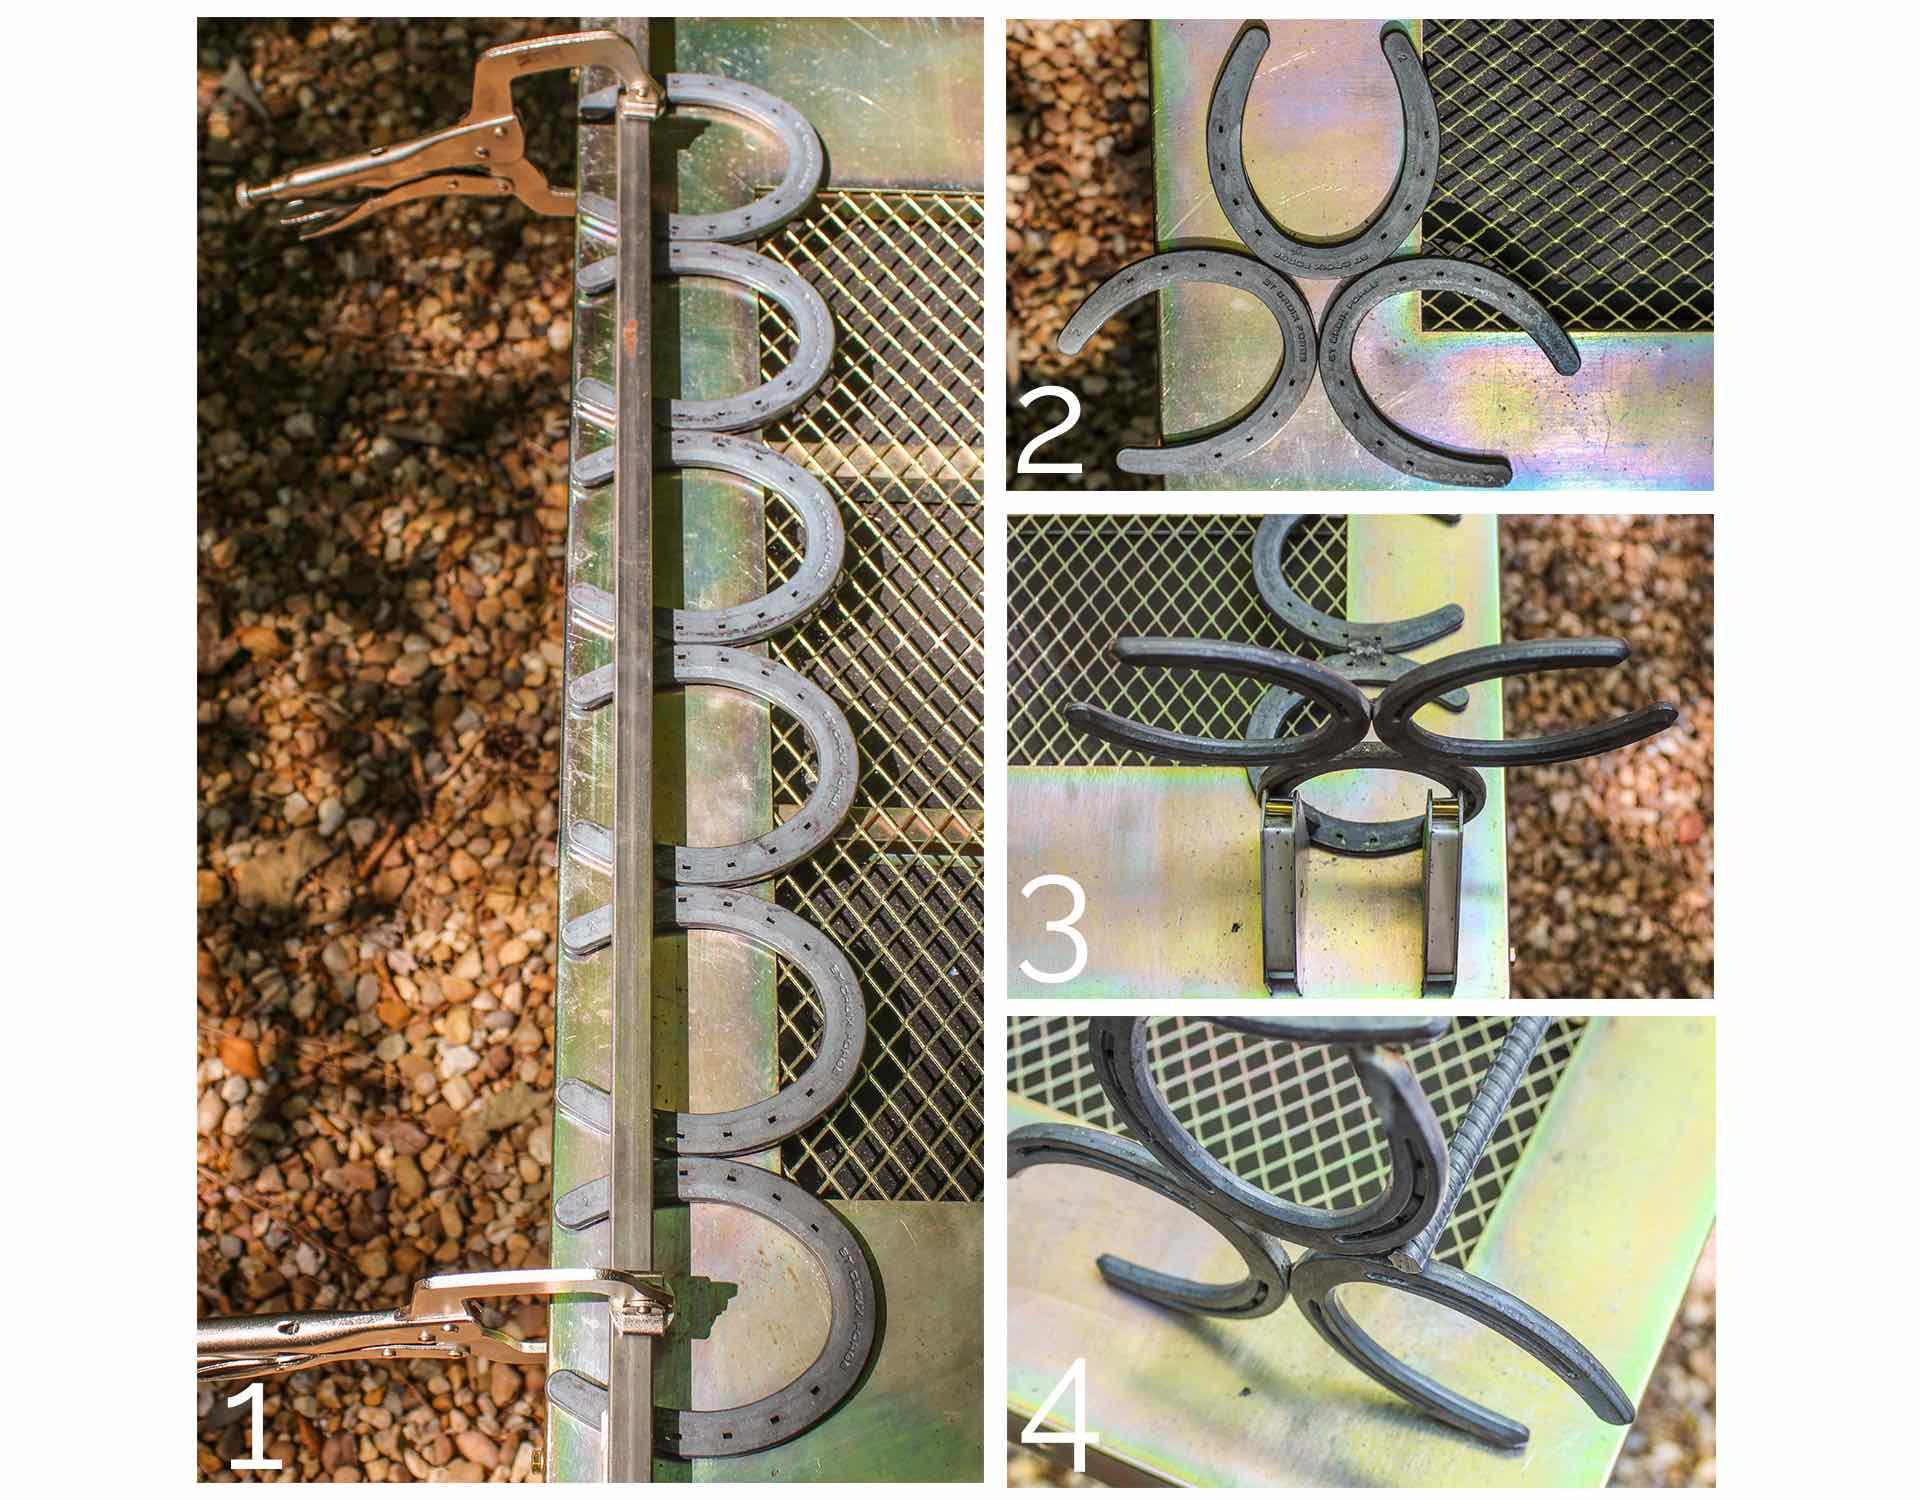 handmade horseshoe book rack steps